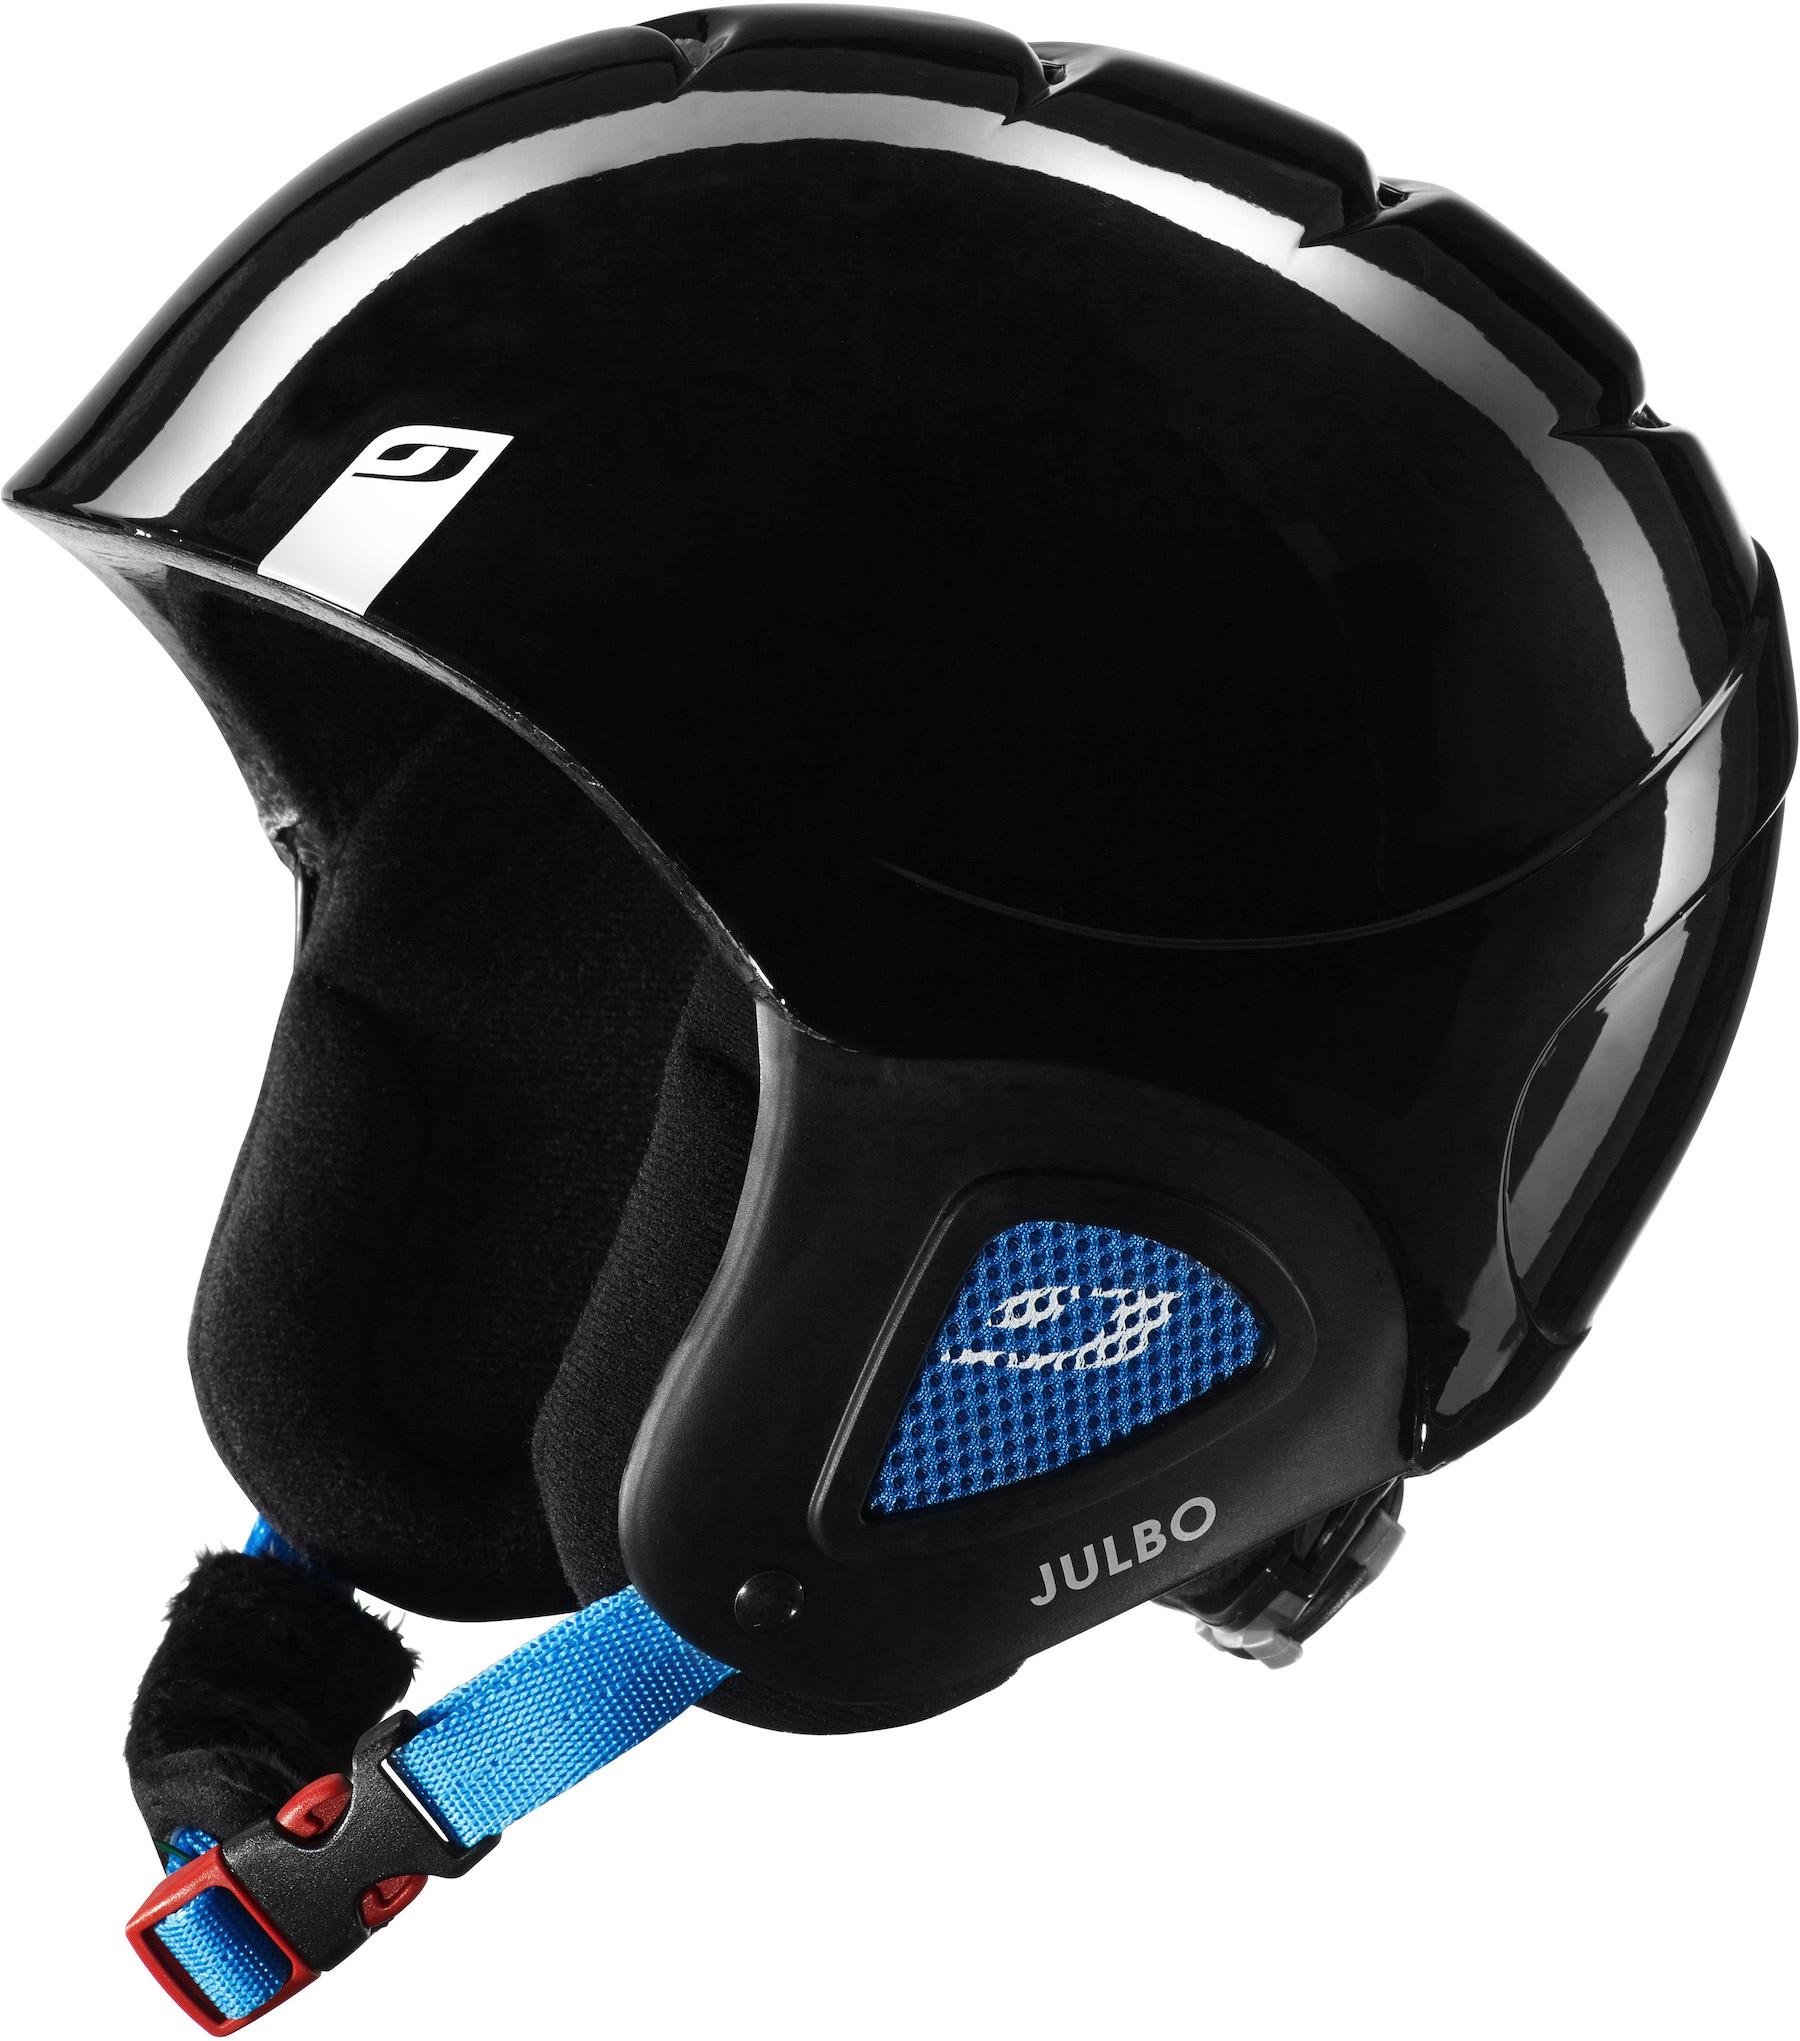 Julbo - First - Ski helmet - Kids